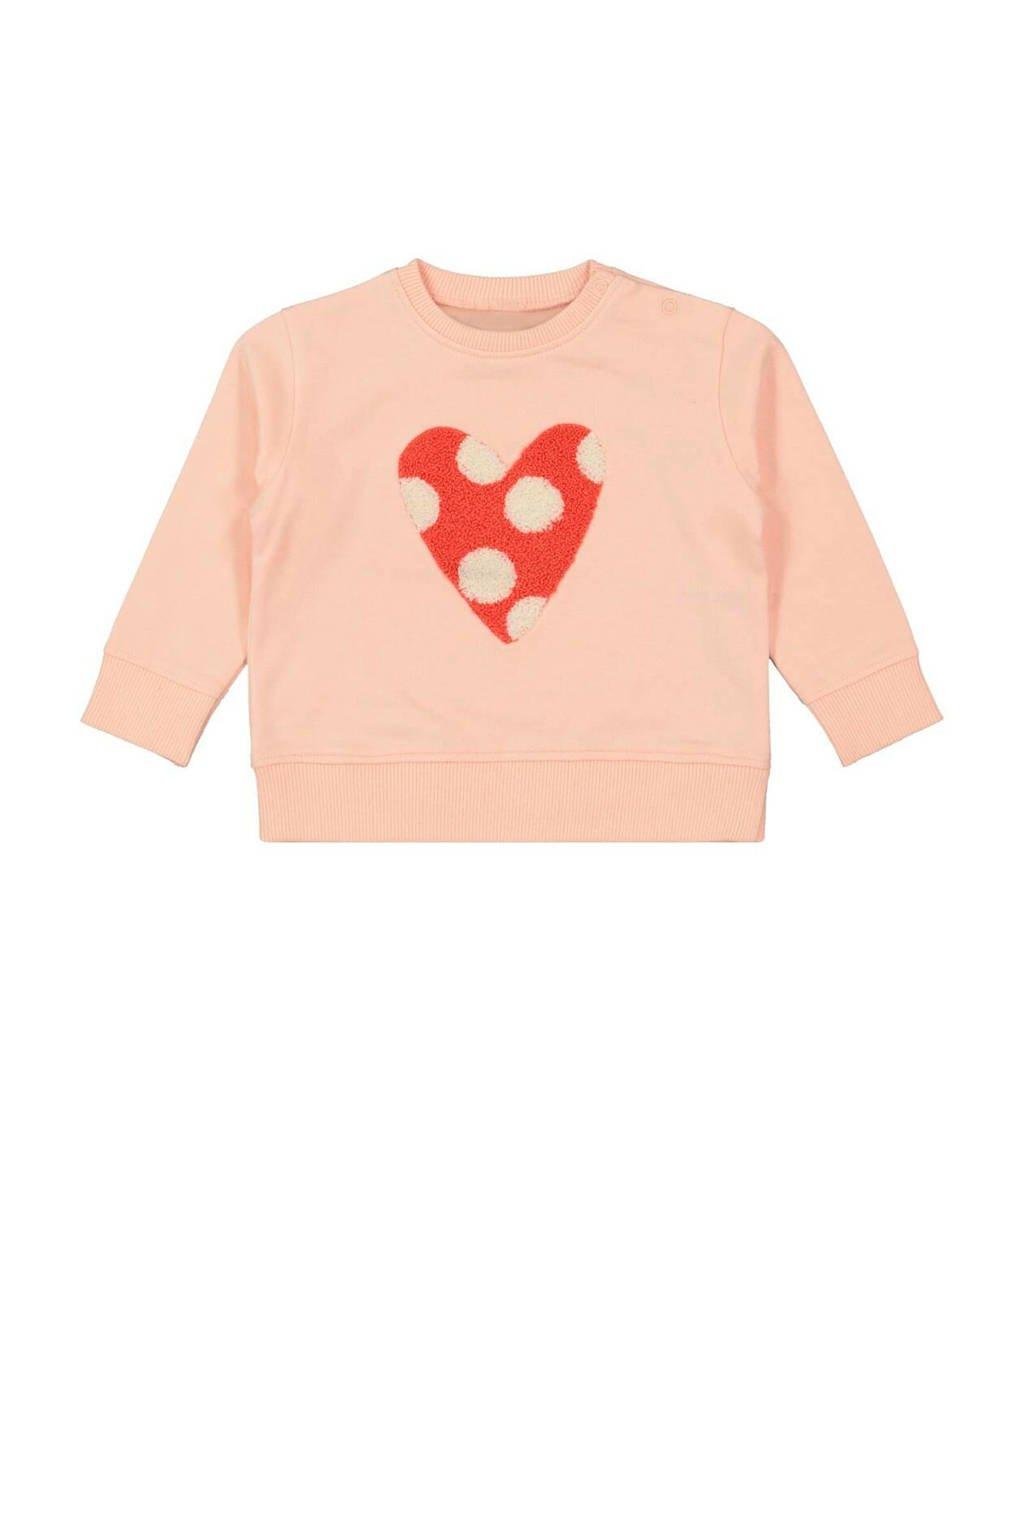 HEMA sweater met 3D applicatie zalm, Zalmroze